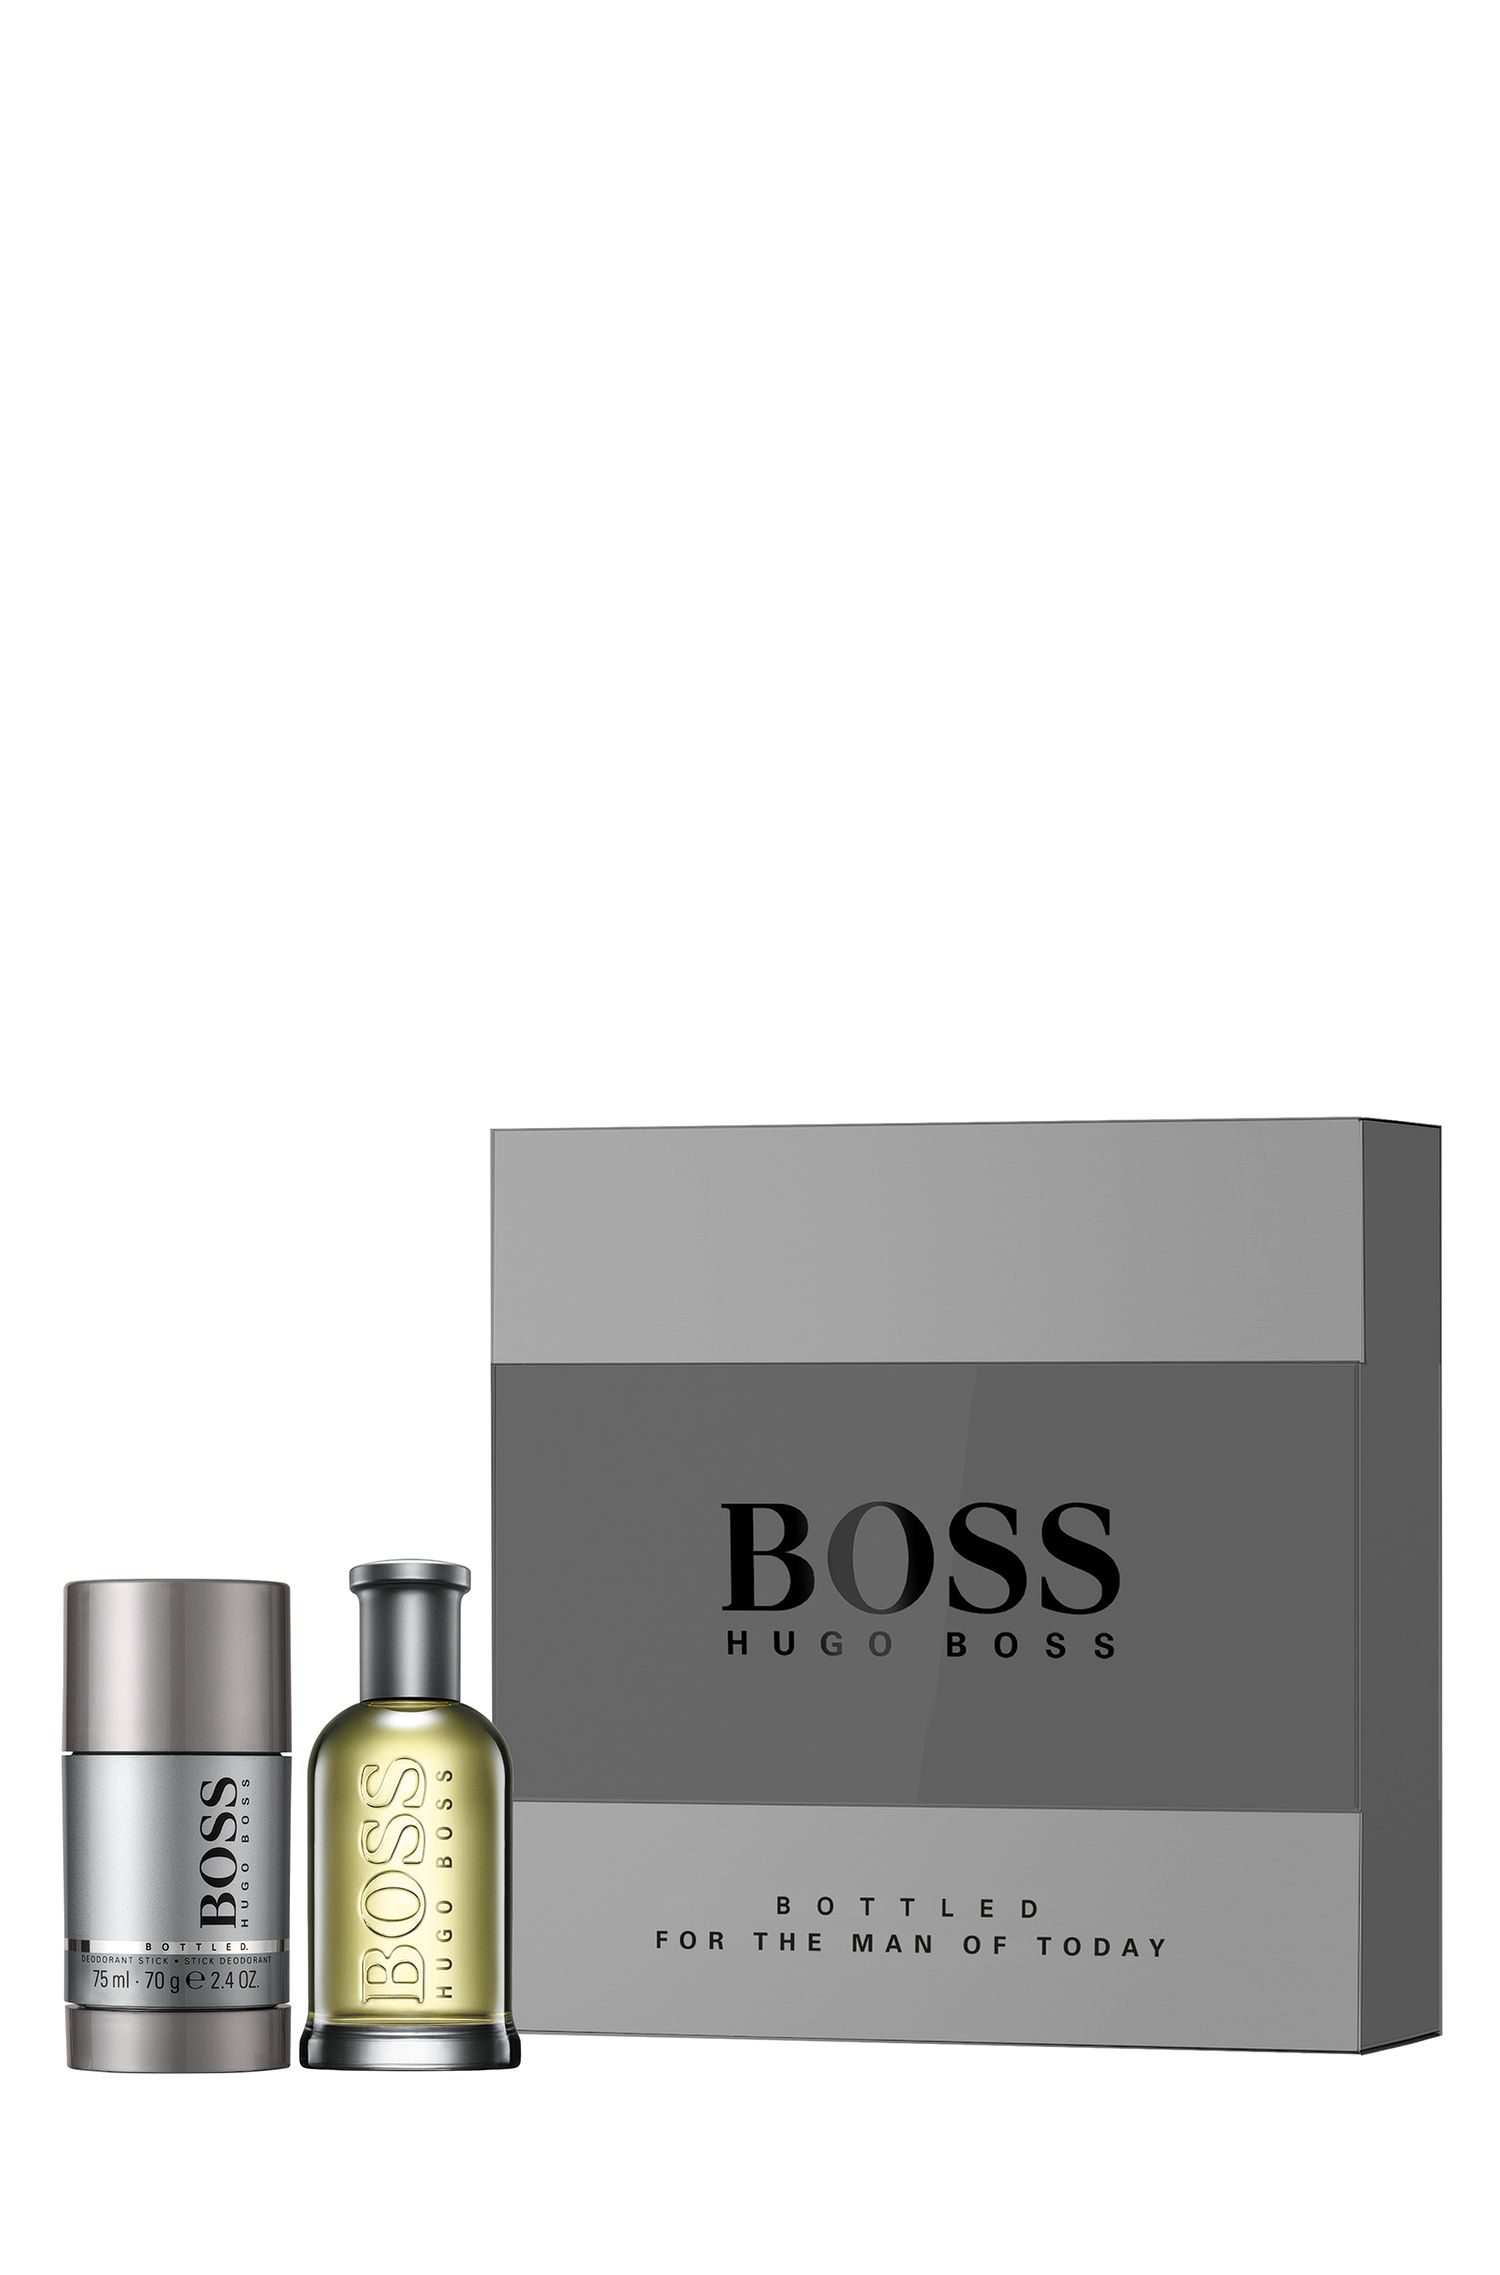 Geschenkset 'BOSS Bottled' mit Eau de Toilette 50 ml und Deo-Stick